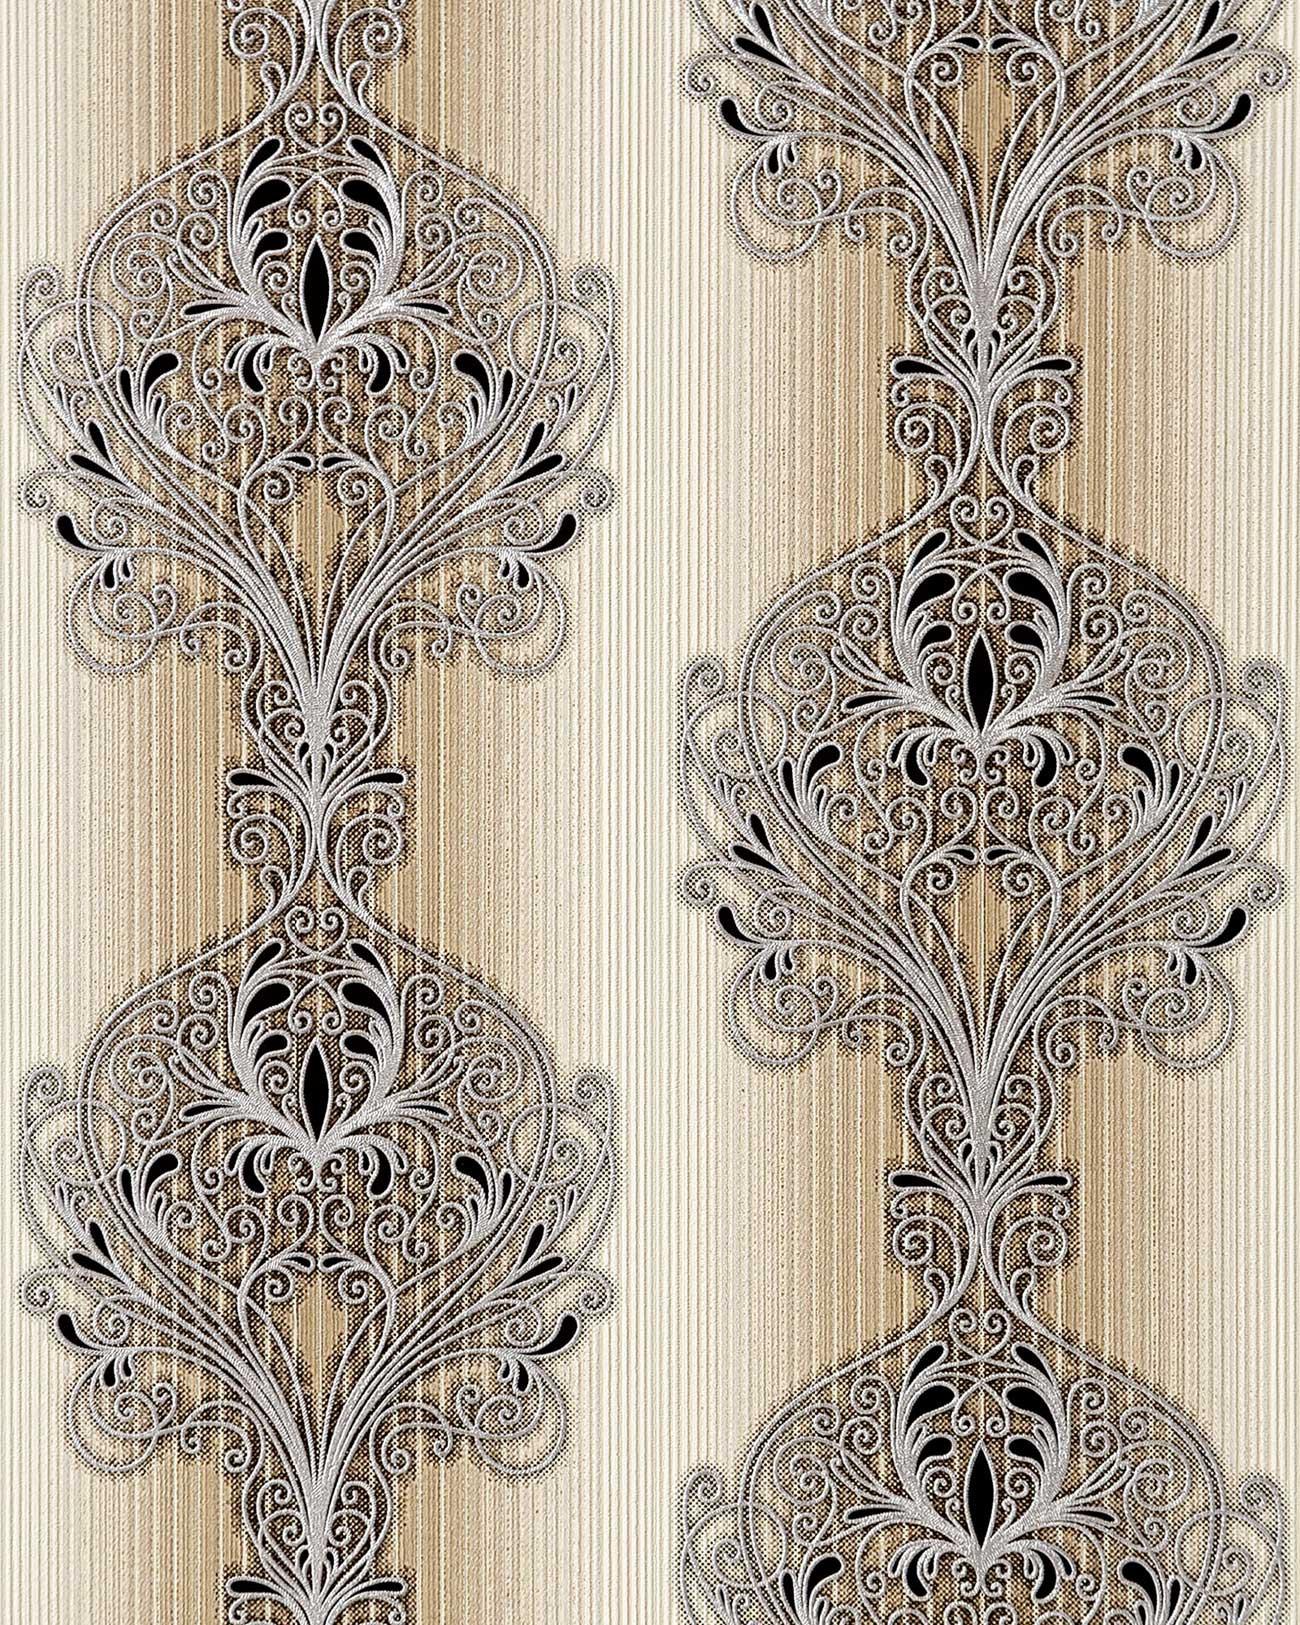 3D Barock Tapete EDEM 096 23 Tapete Damask Prunkvolle Ornament Designs Braun  Hellbraun Beige ...